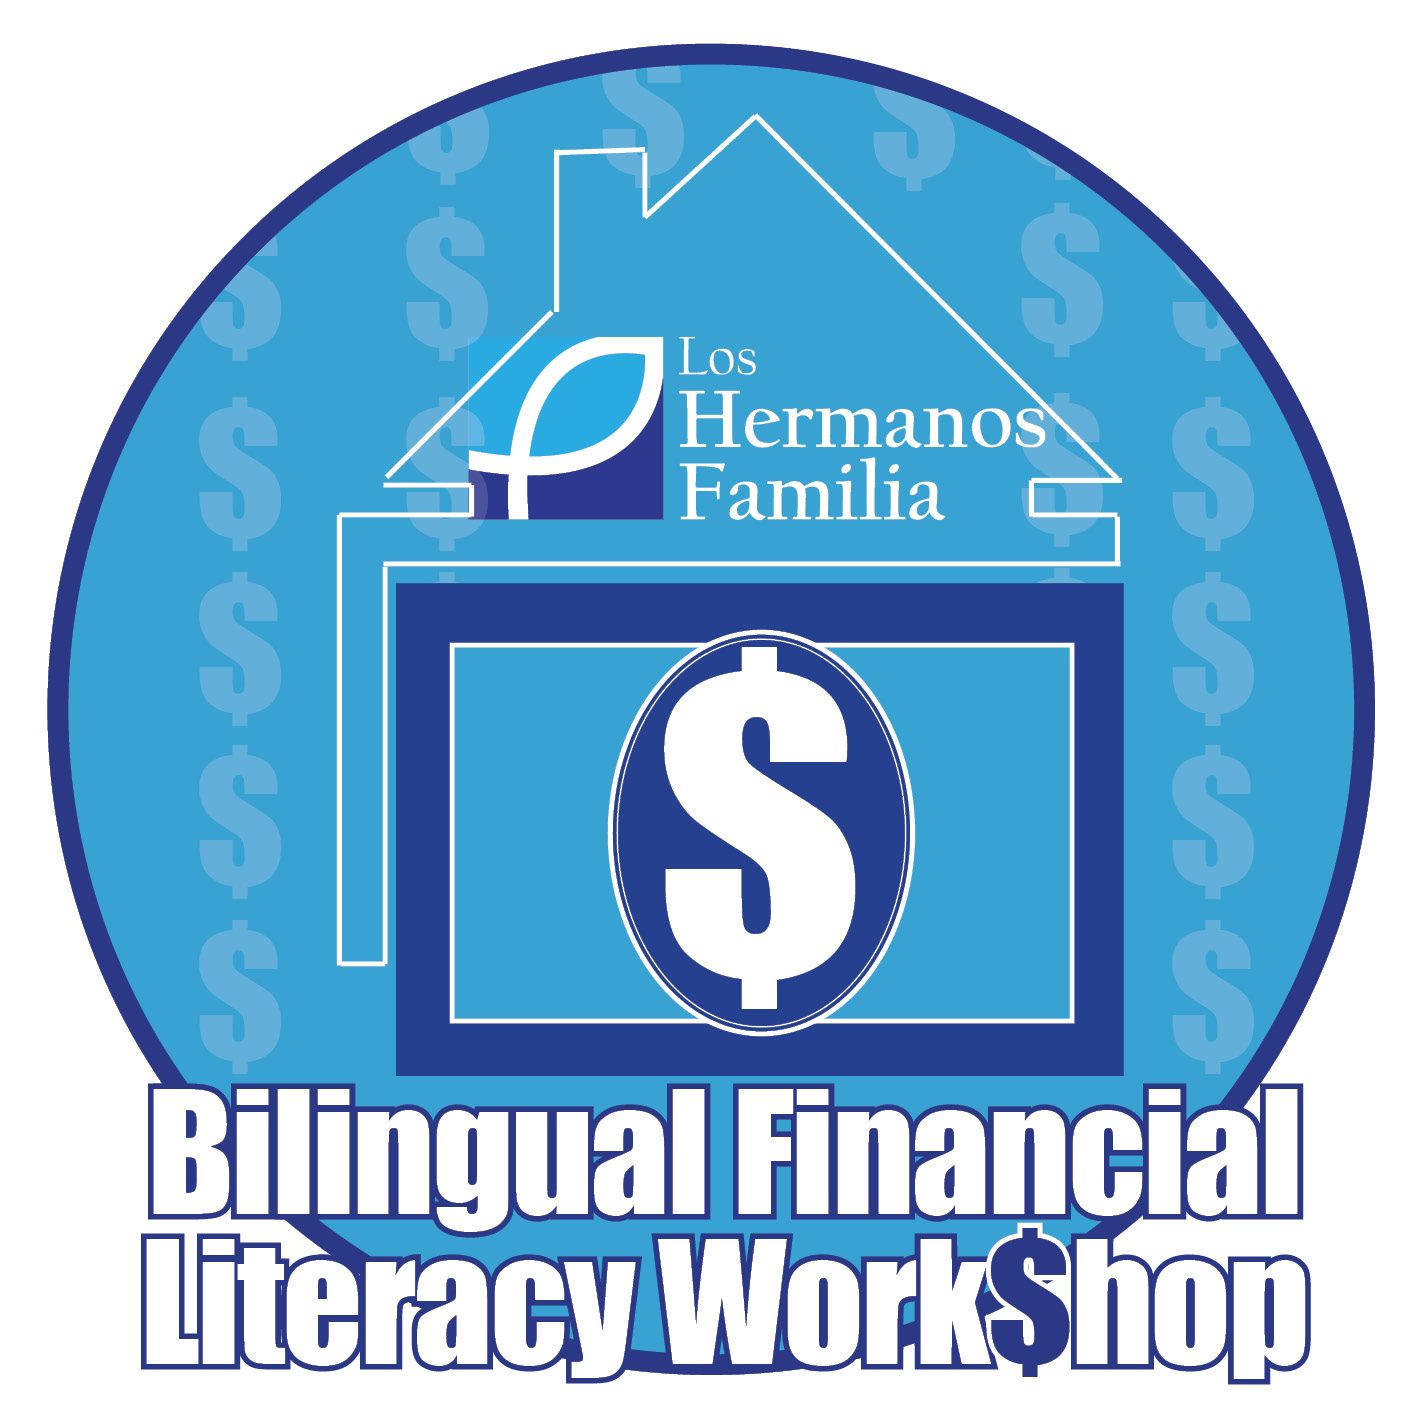 Bilingual Financial Literacy Workshop - round